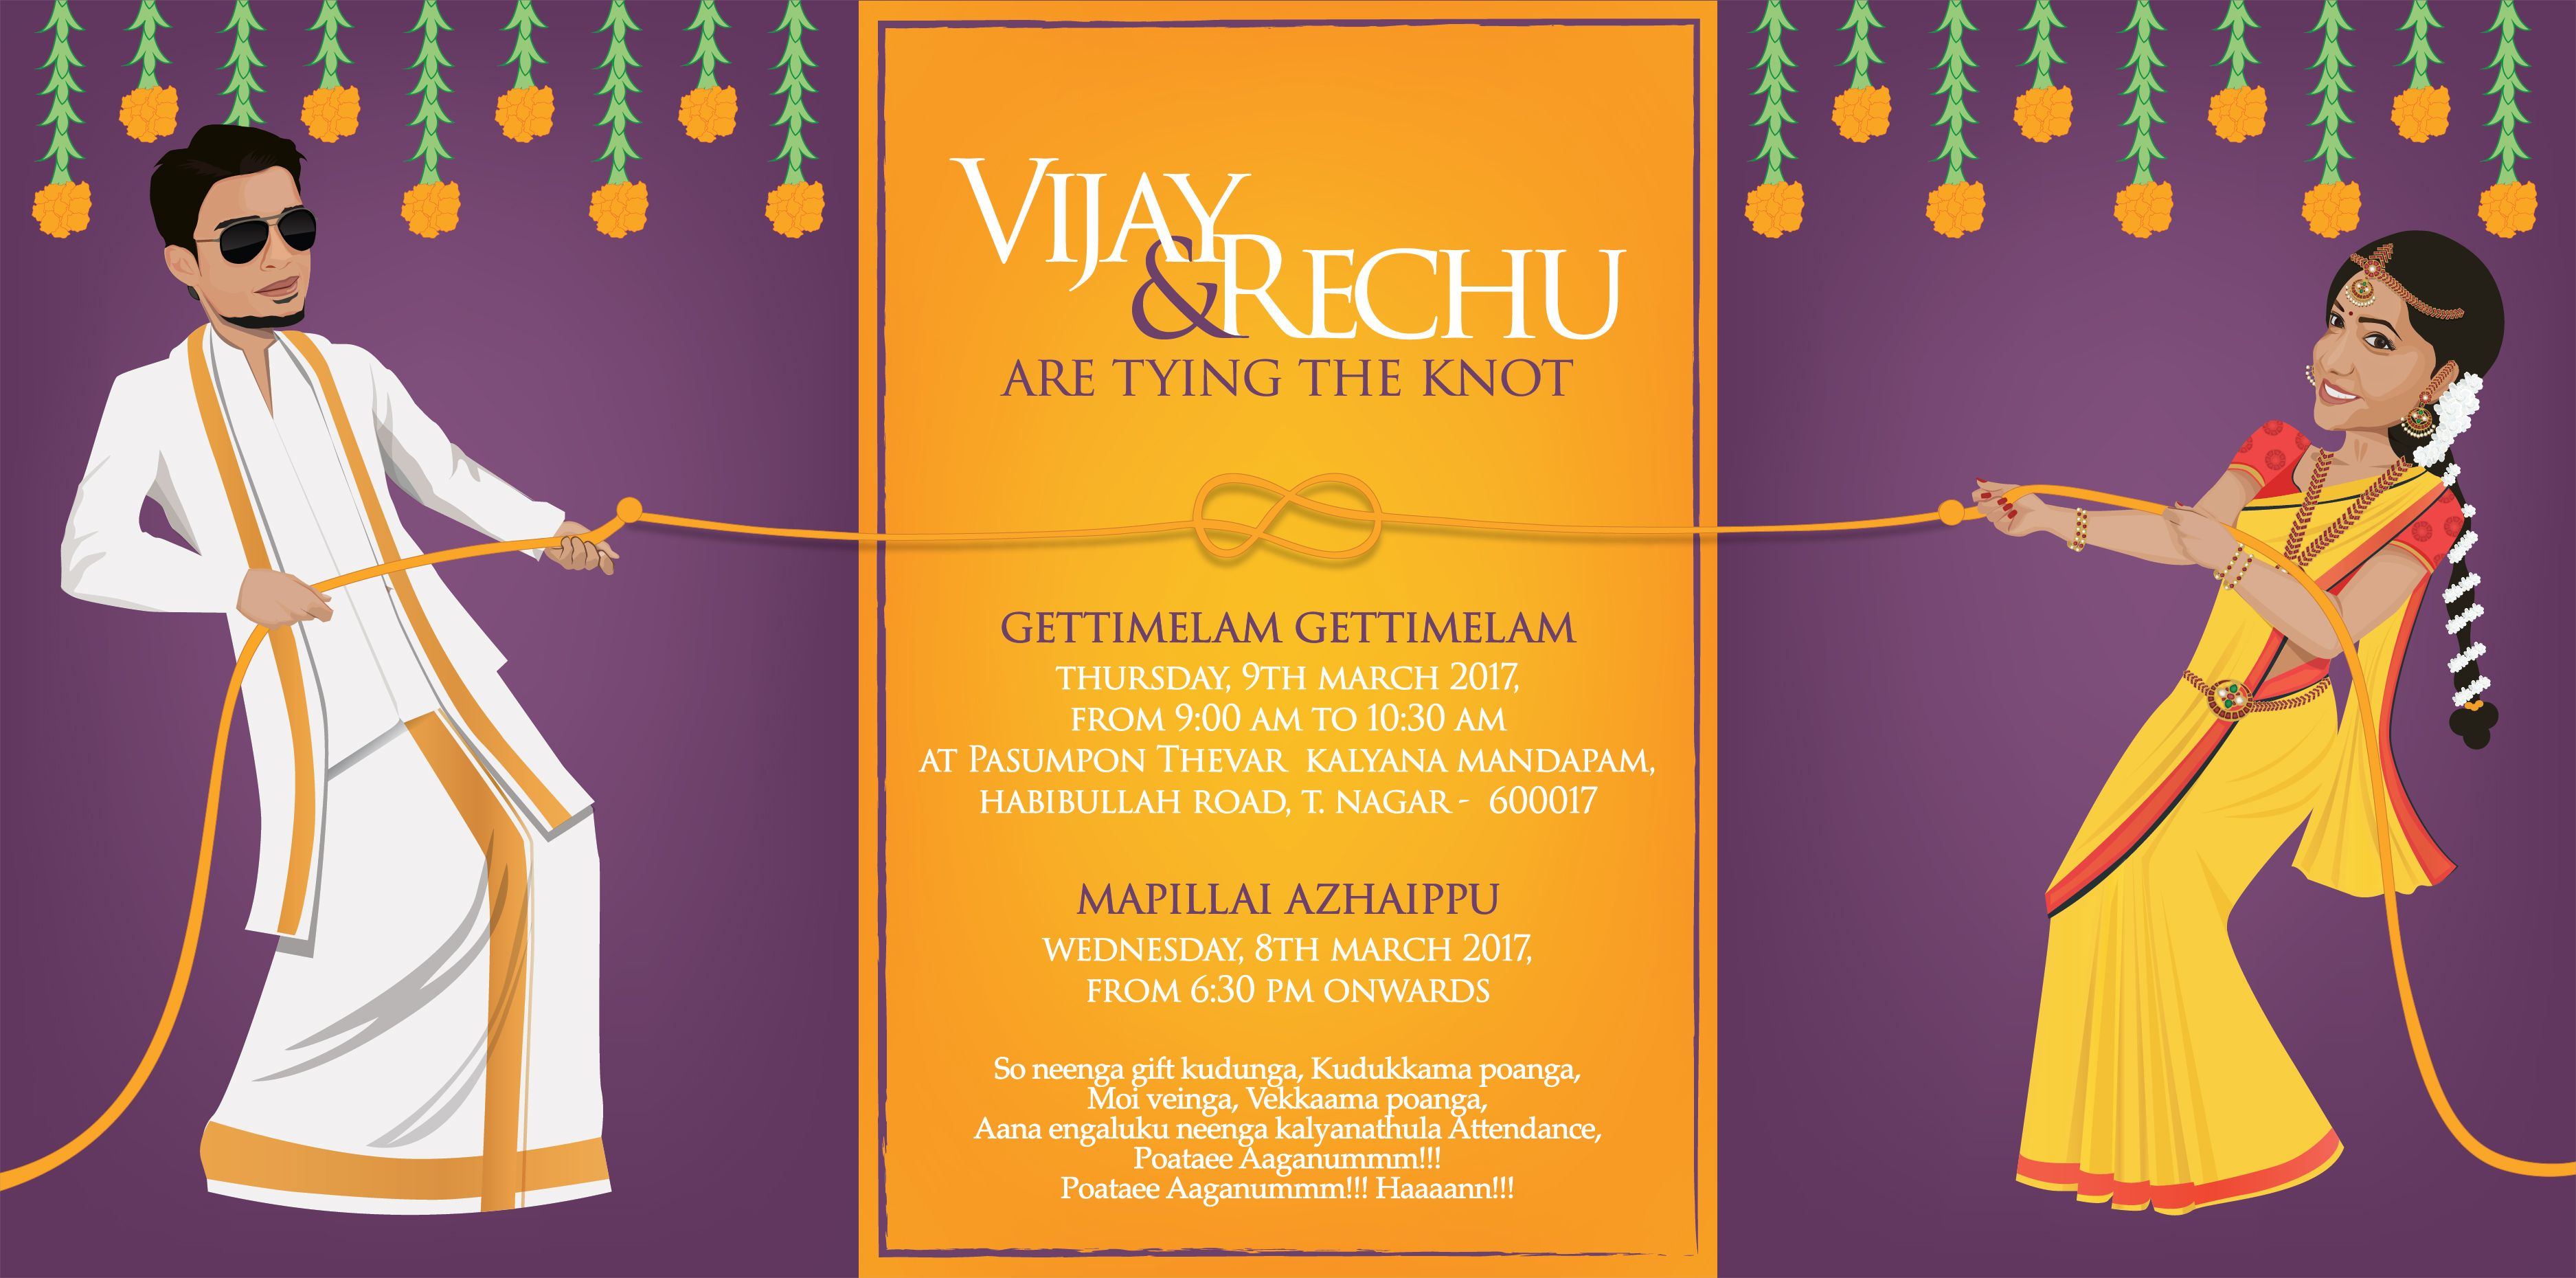 Tamil Quotes For Wedding Invitation: Wedding Card Design